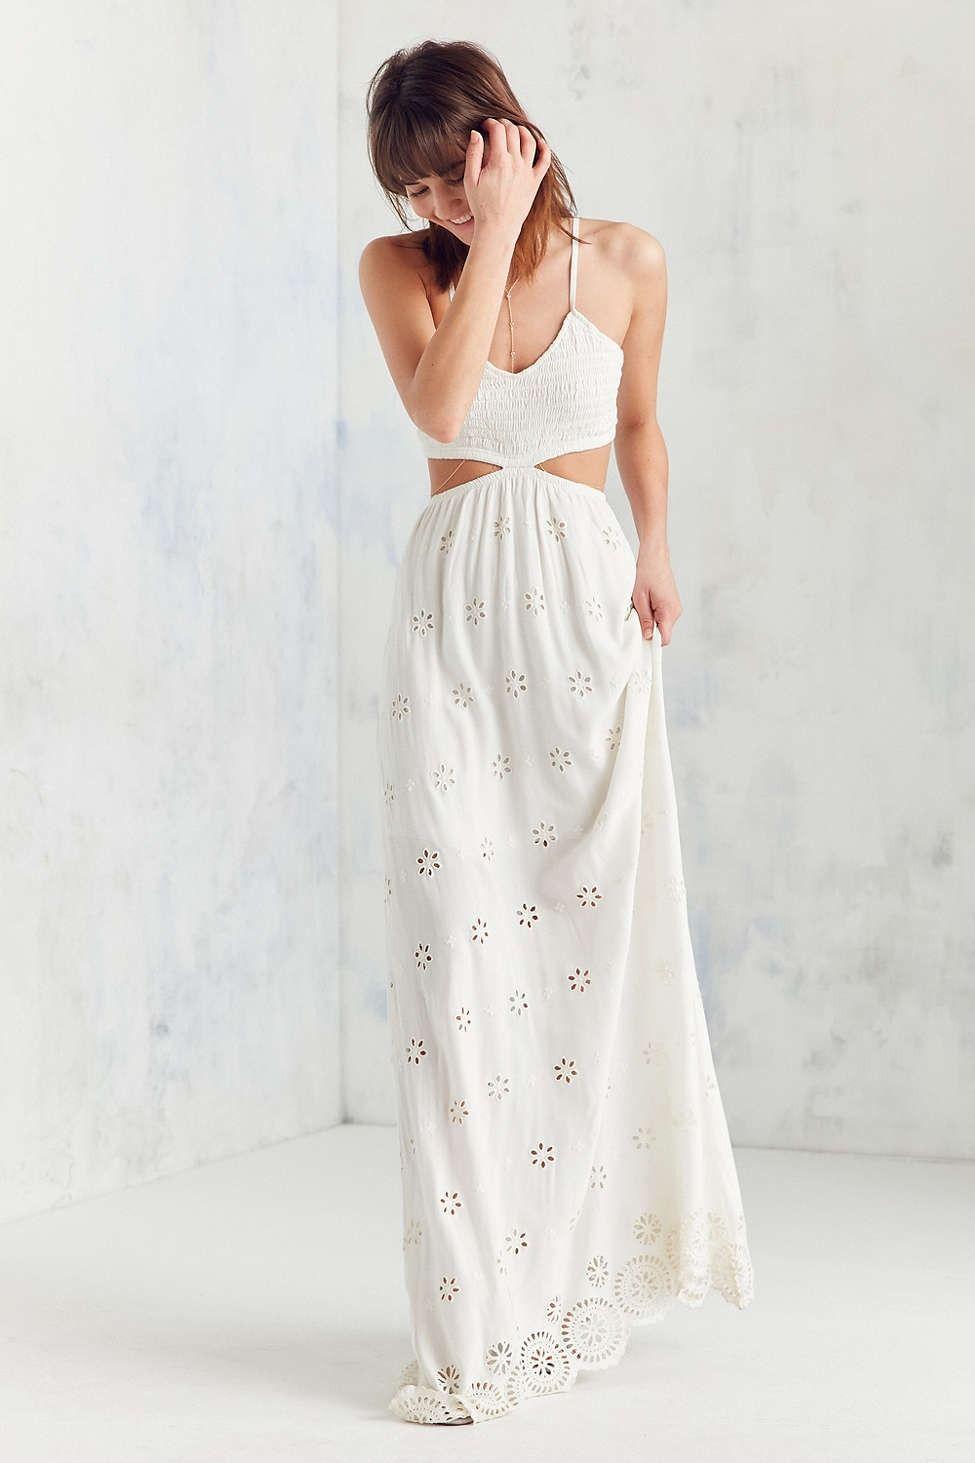 Winston White Eyelet Cutout Maxi Dress - Urban Outfitters  Cutout